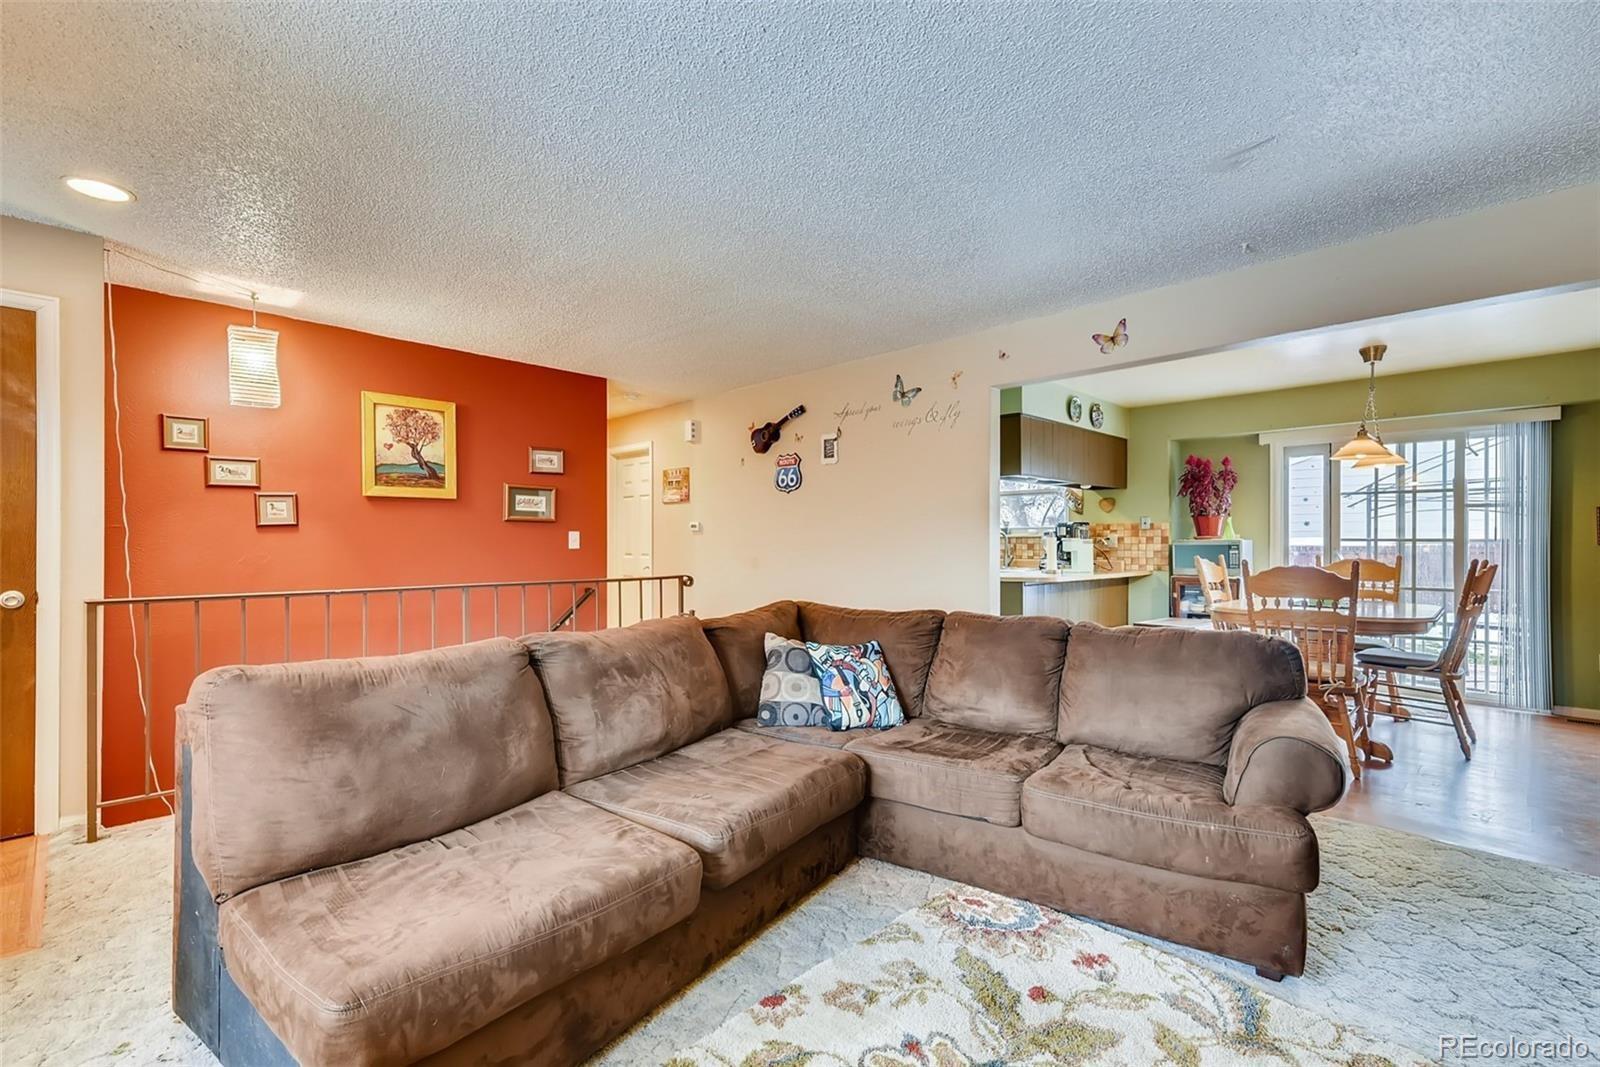 MLS# 7608715 - 19 - 5476 E 113th Place, Thornton, CO 80233